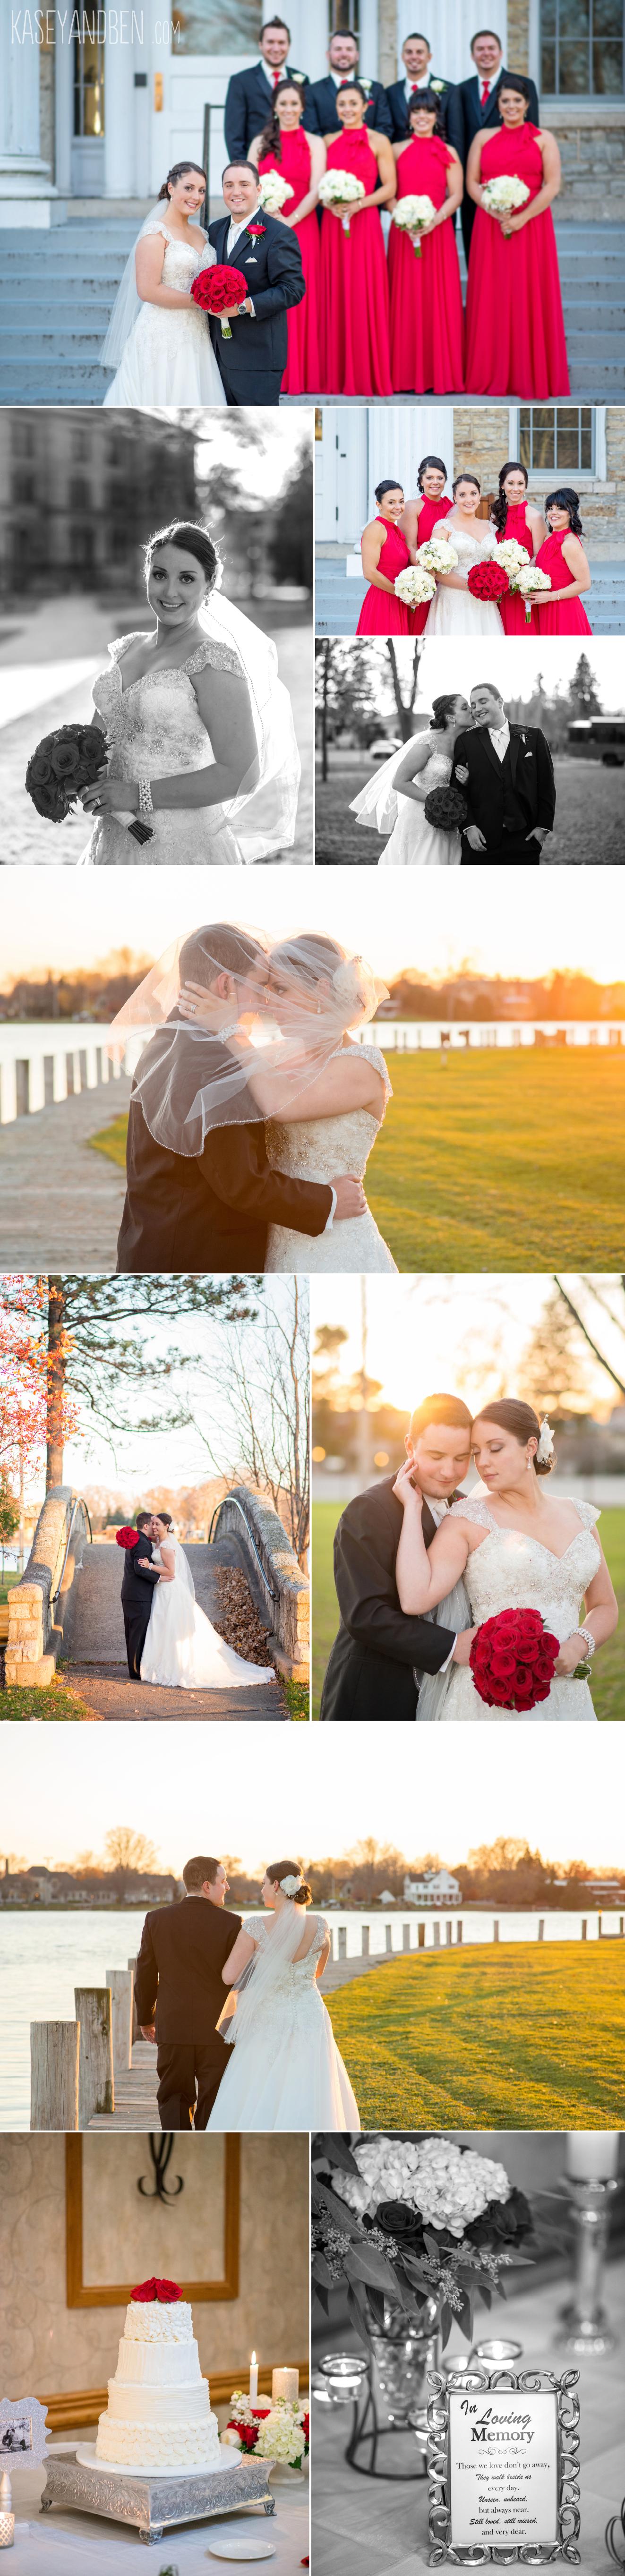 Appleton-Doty-Park-Wedding-Neenah-Fall-Church-Photography-November-Catholic-Green-Bay1